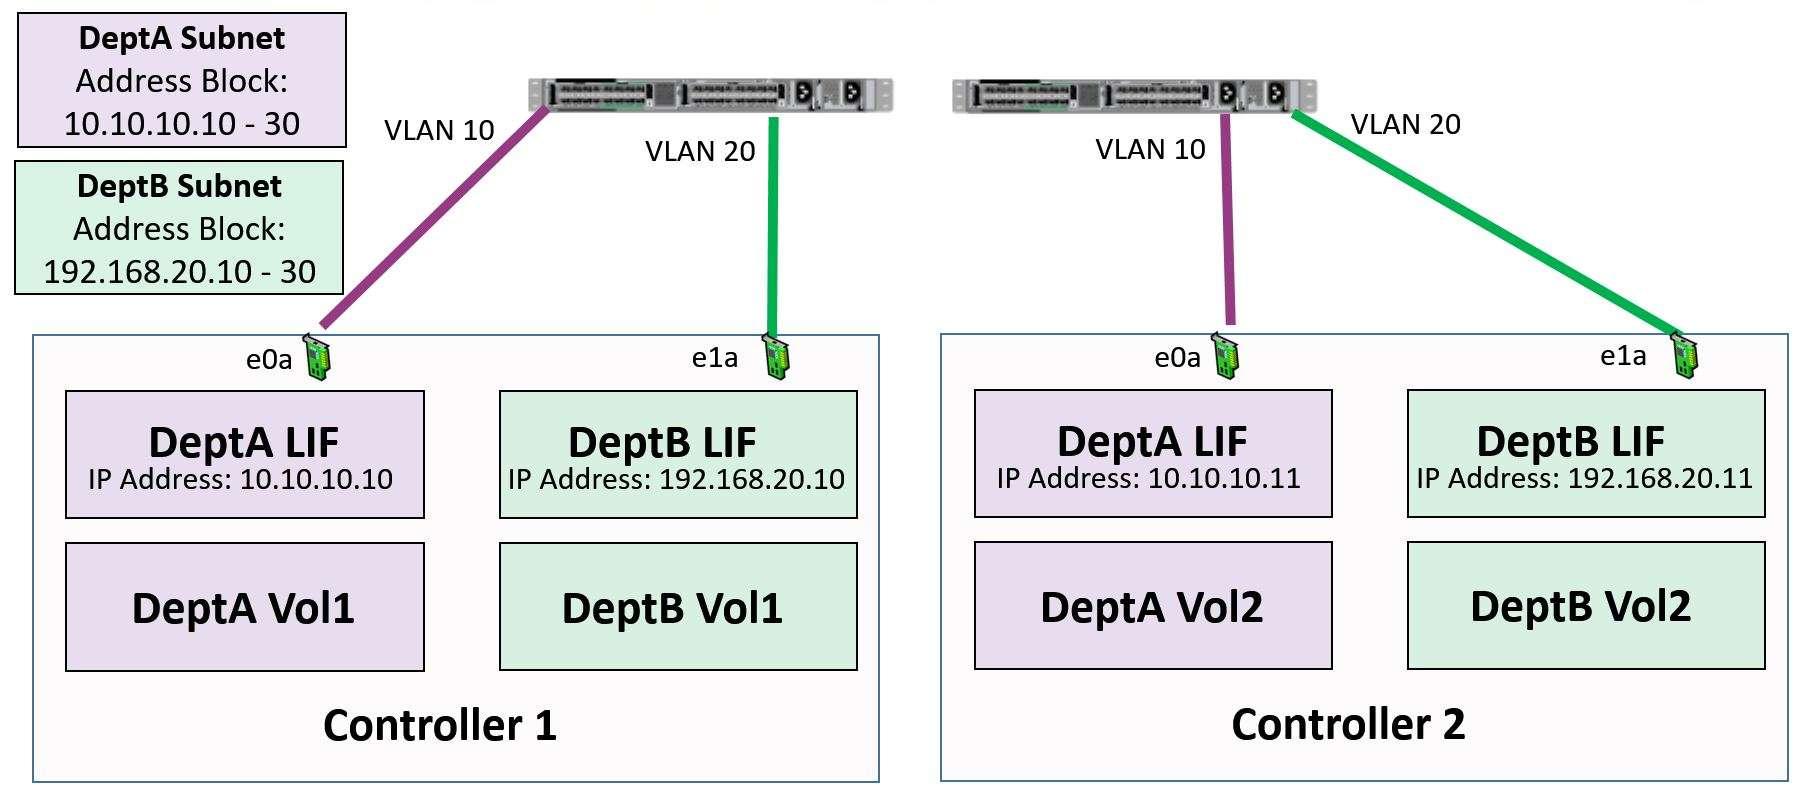 NetApp Subnets Networking Tutorial - FlackBox